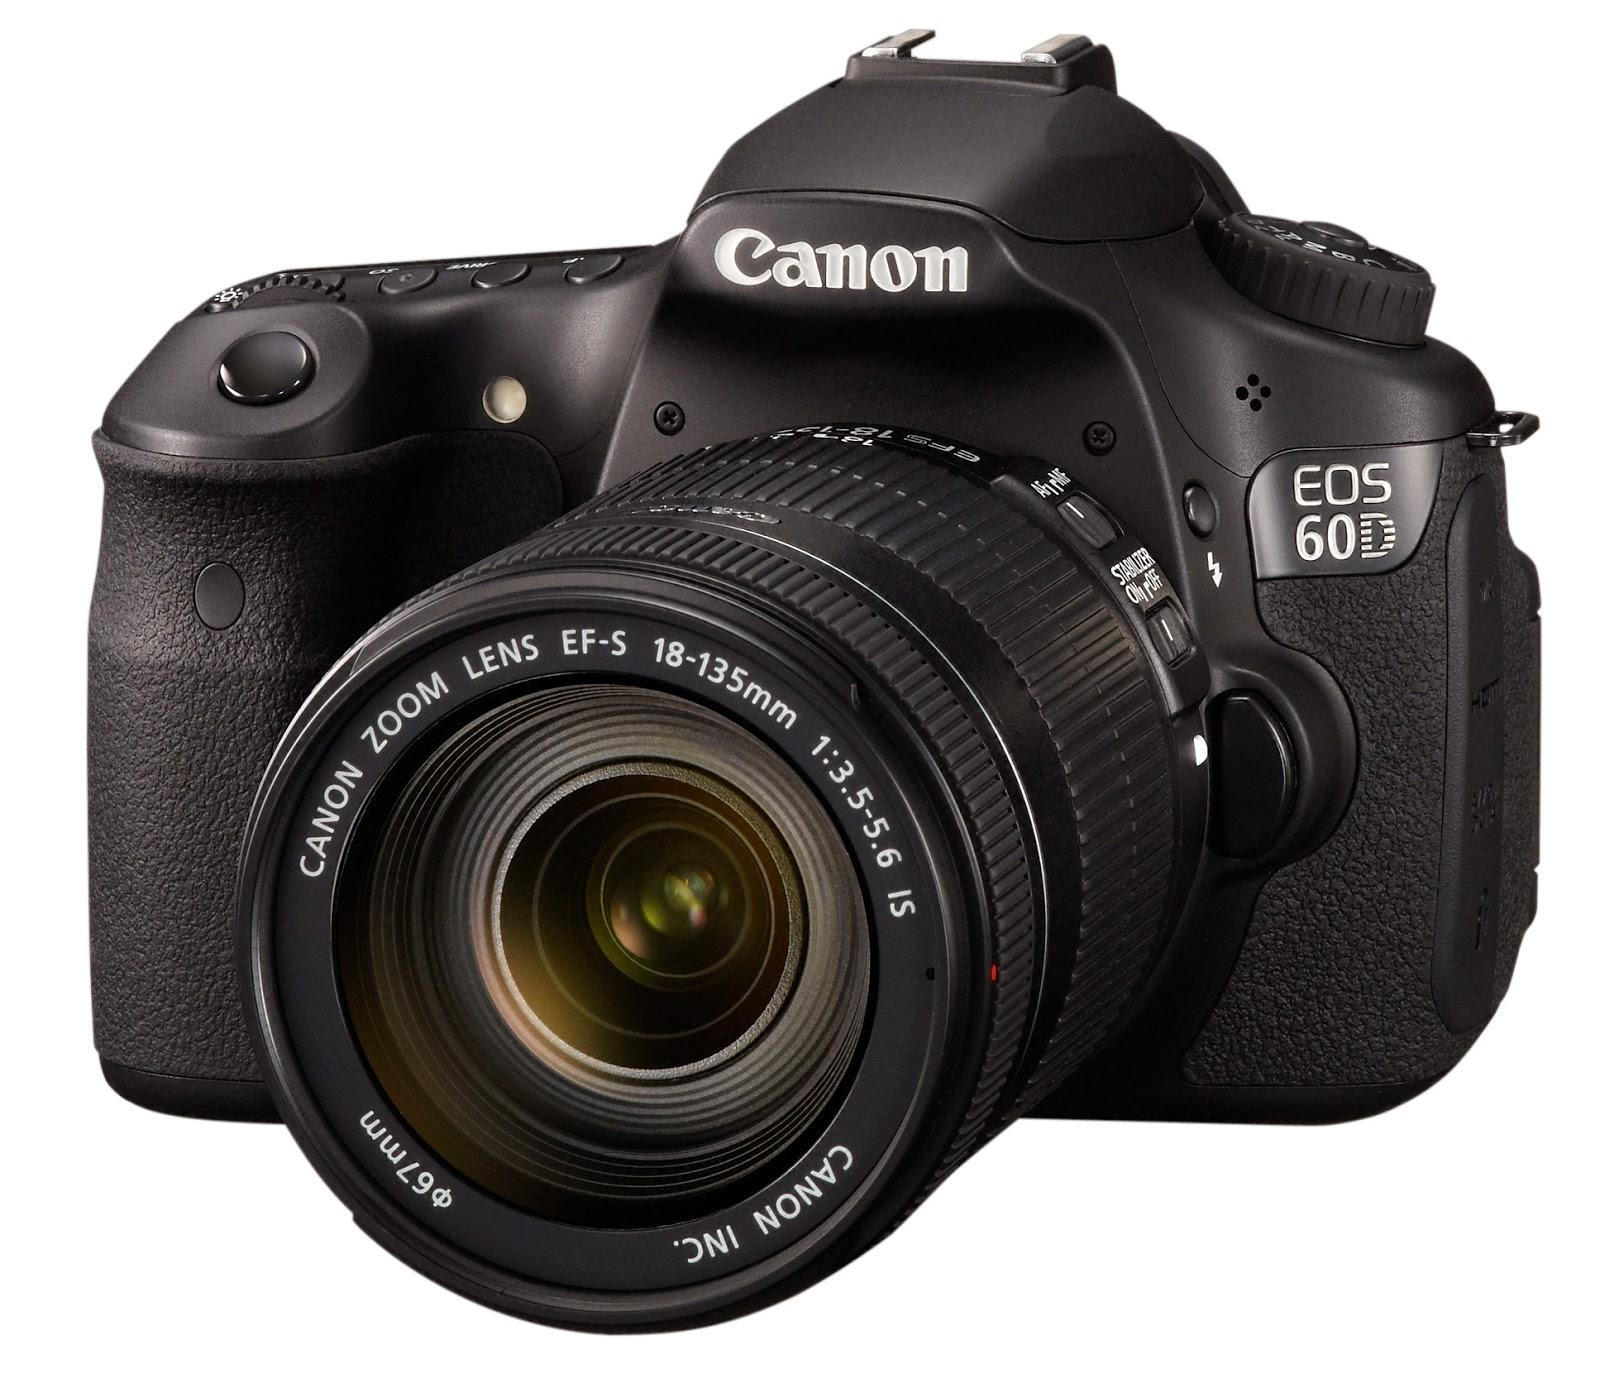 spesifikasi canon 60D terbaru